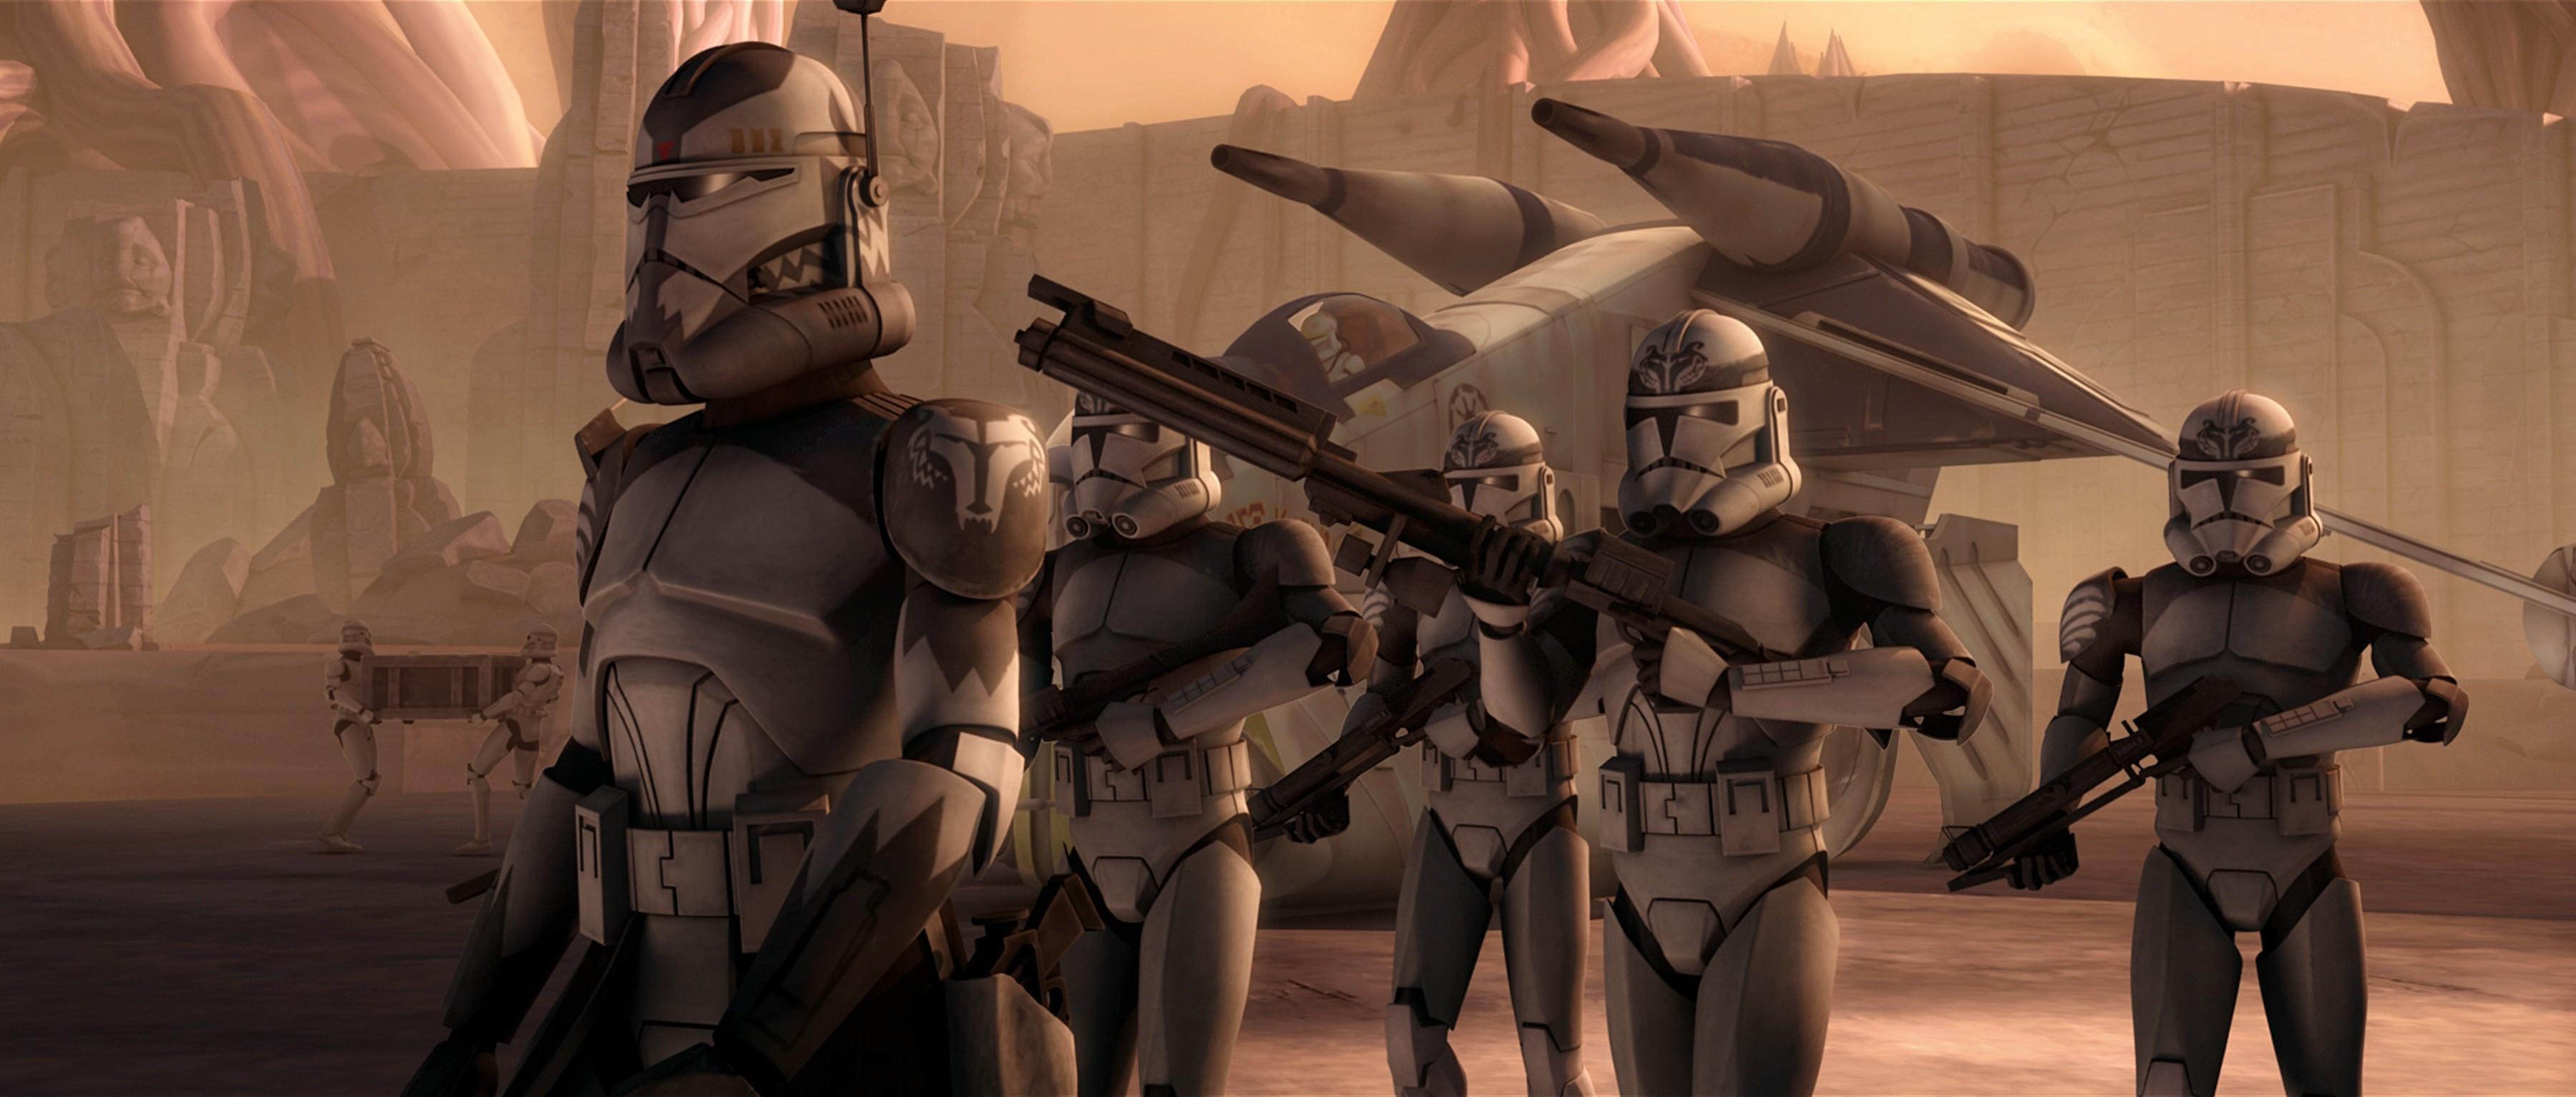 Get Clone Trooper Wallpaper Hd Gif